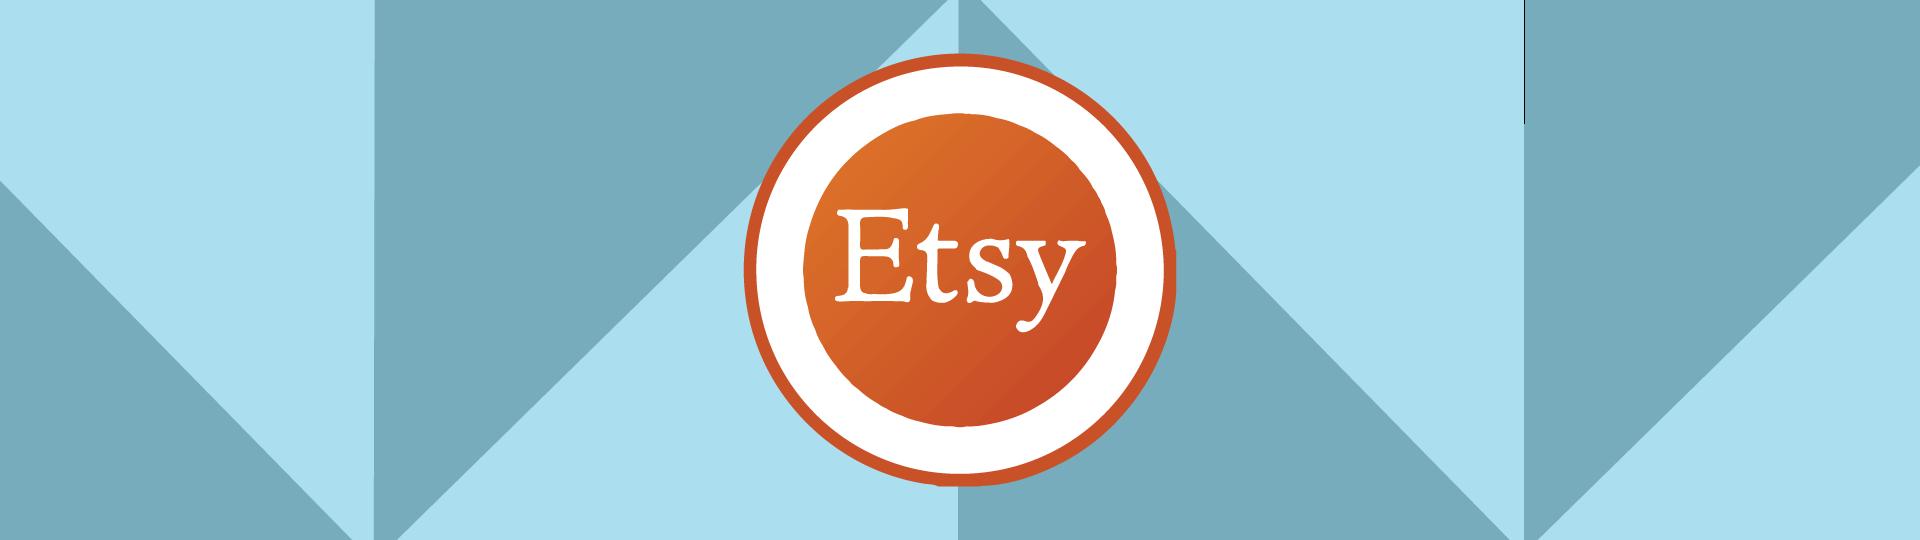 etsy-banner-1920x540